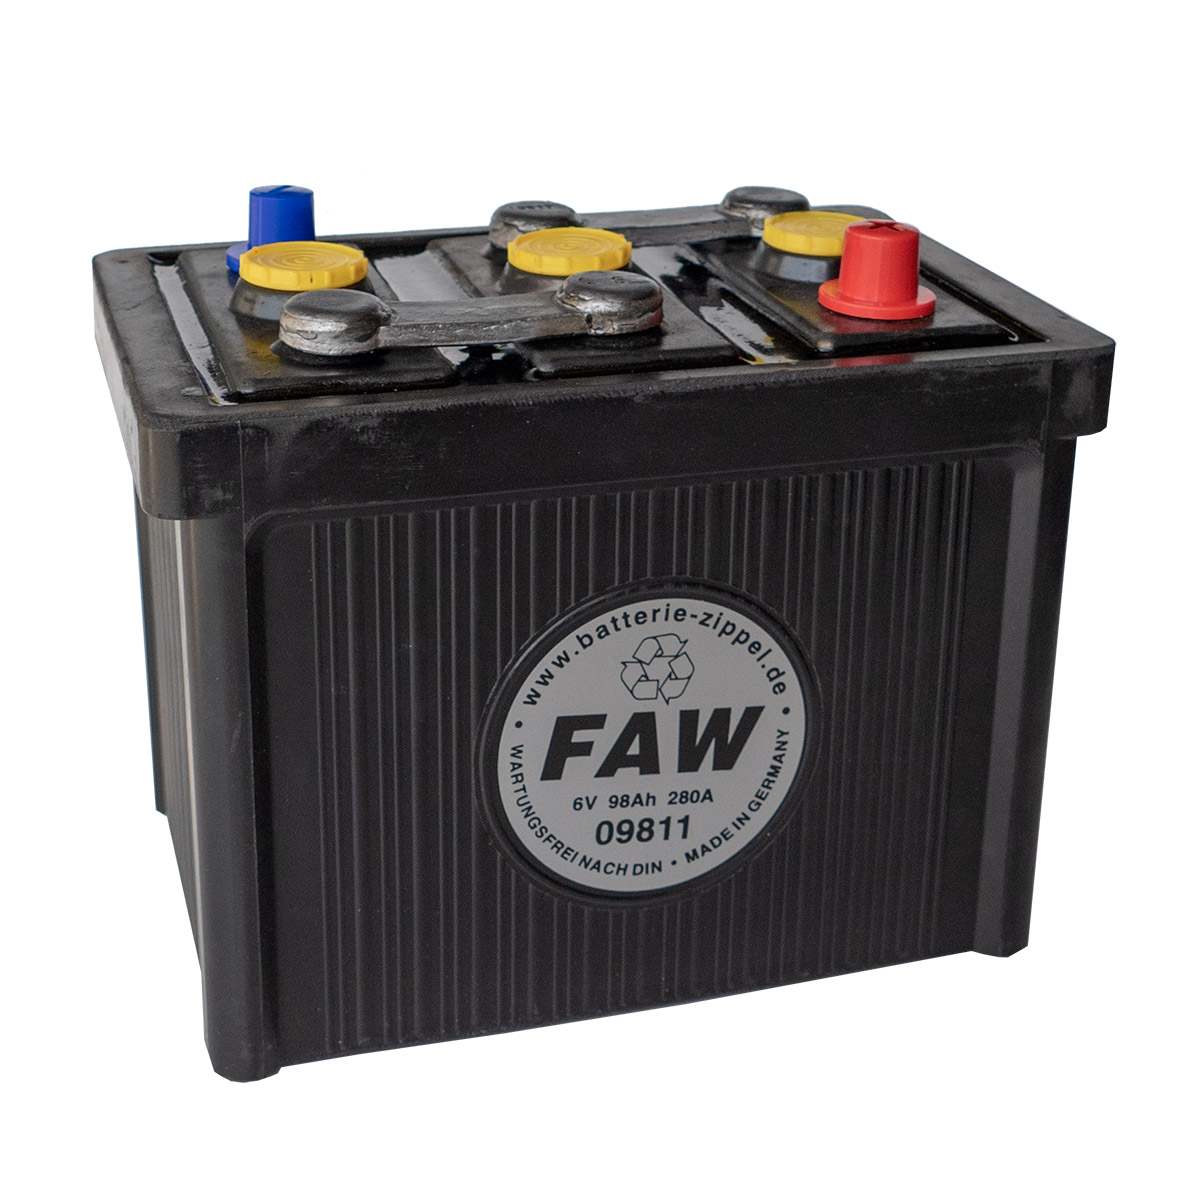 Faw Oldtimerbatterie 09811 6v 98ah Batterie Zippel De